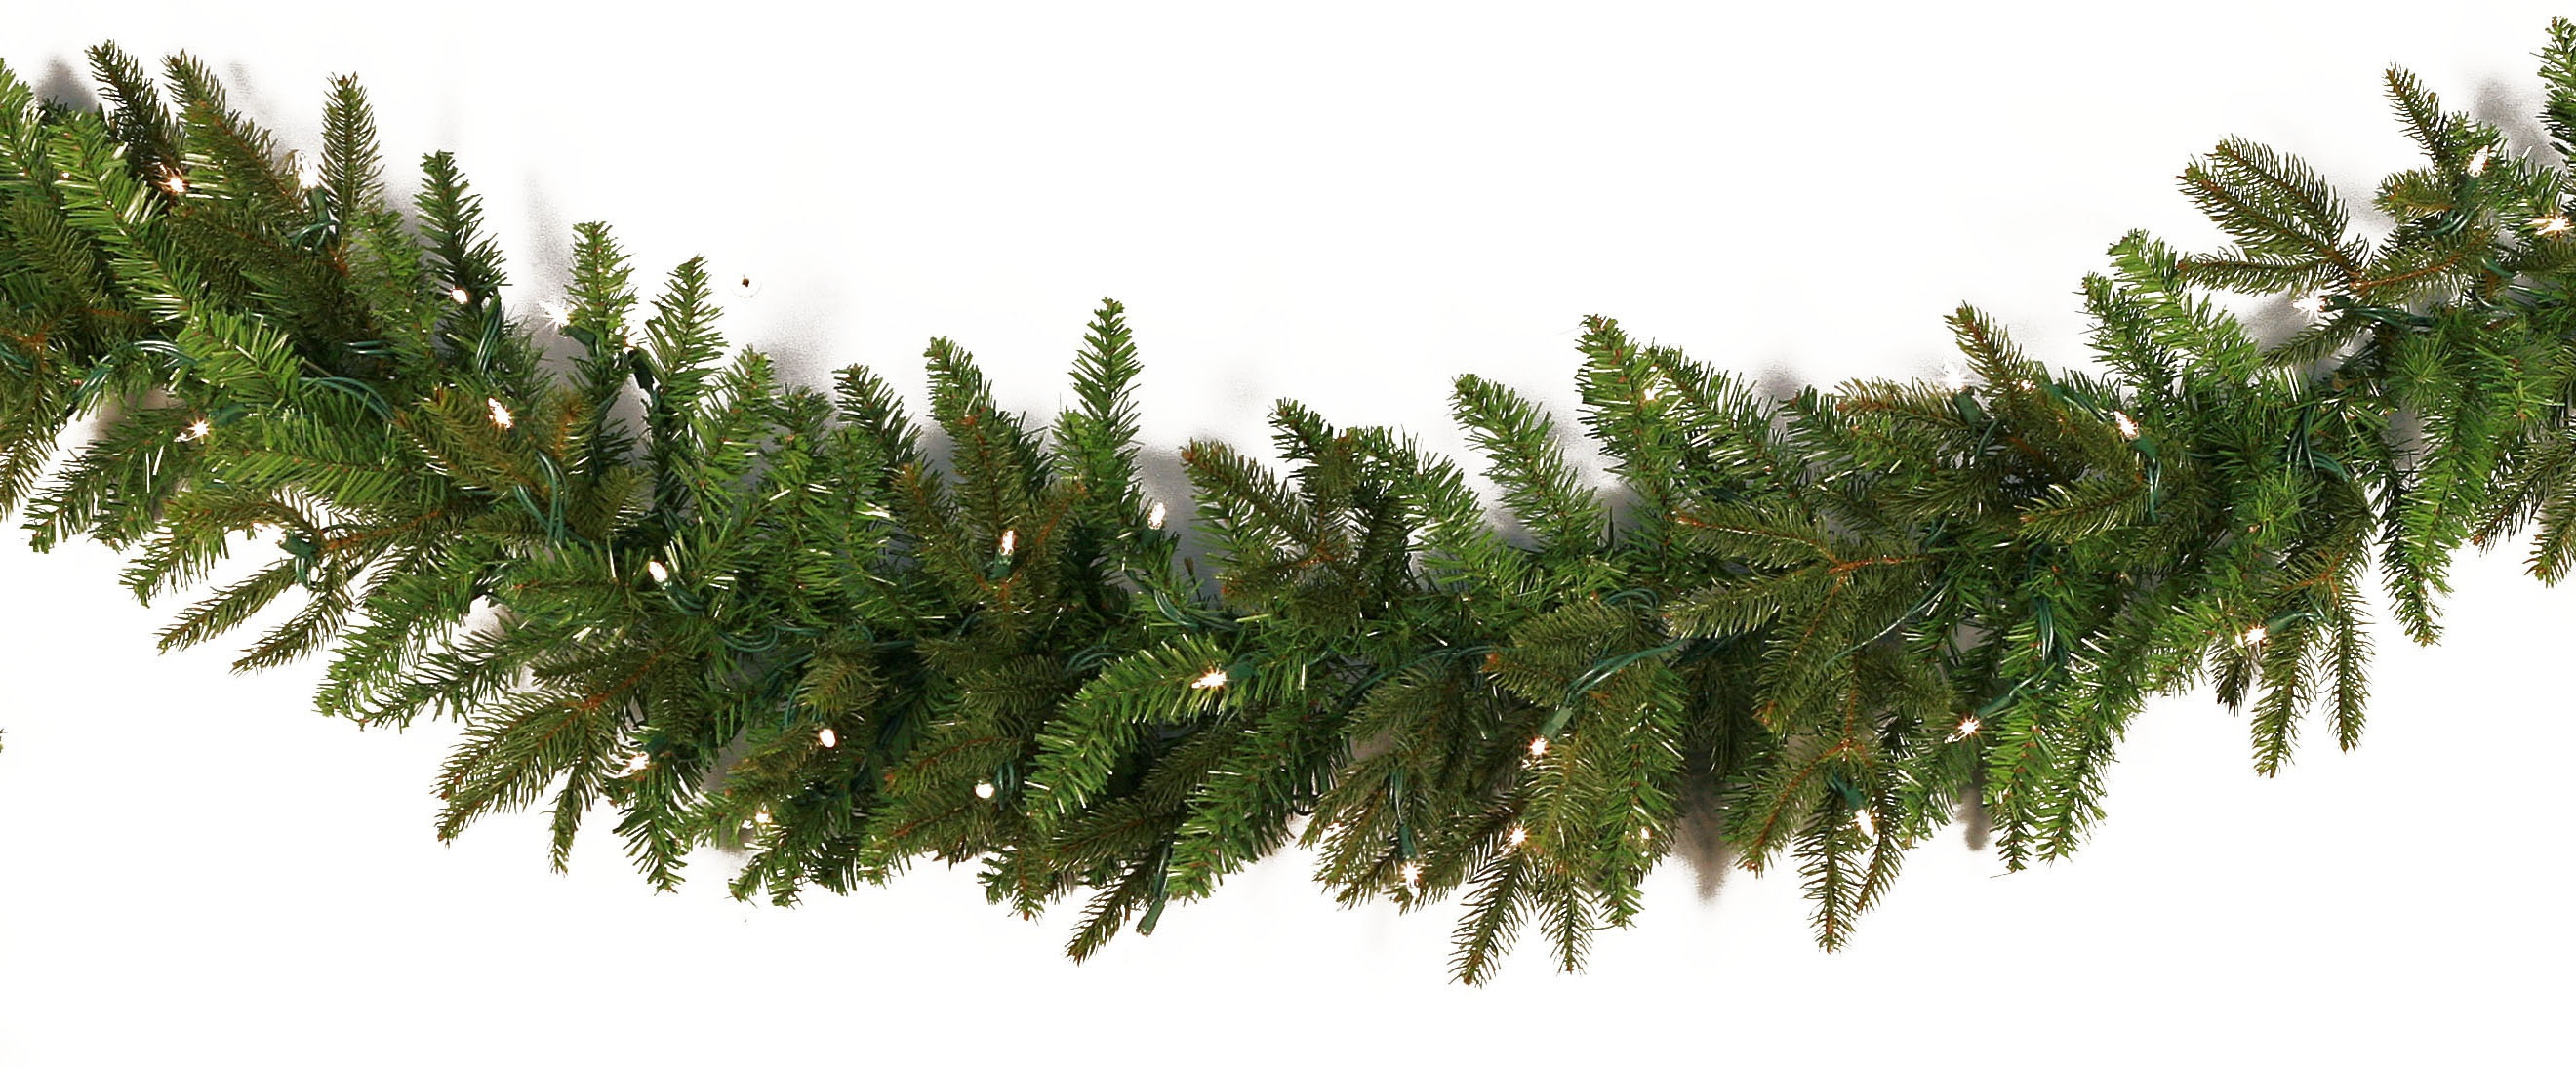 Fraser Fir Prelit Led Christmas Garland Warm White Lights